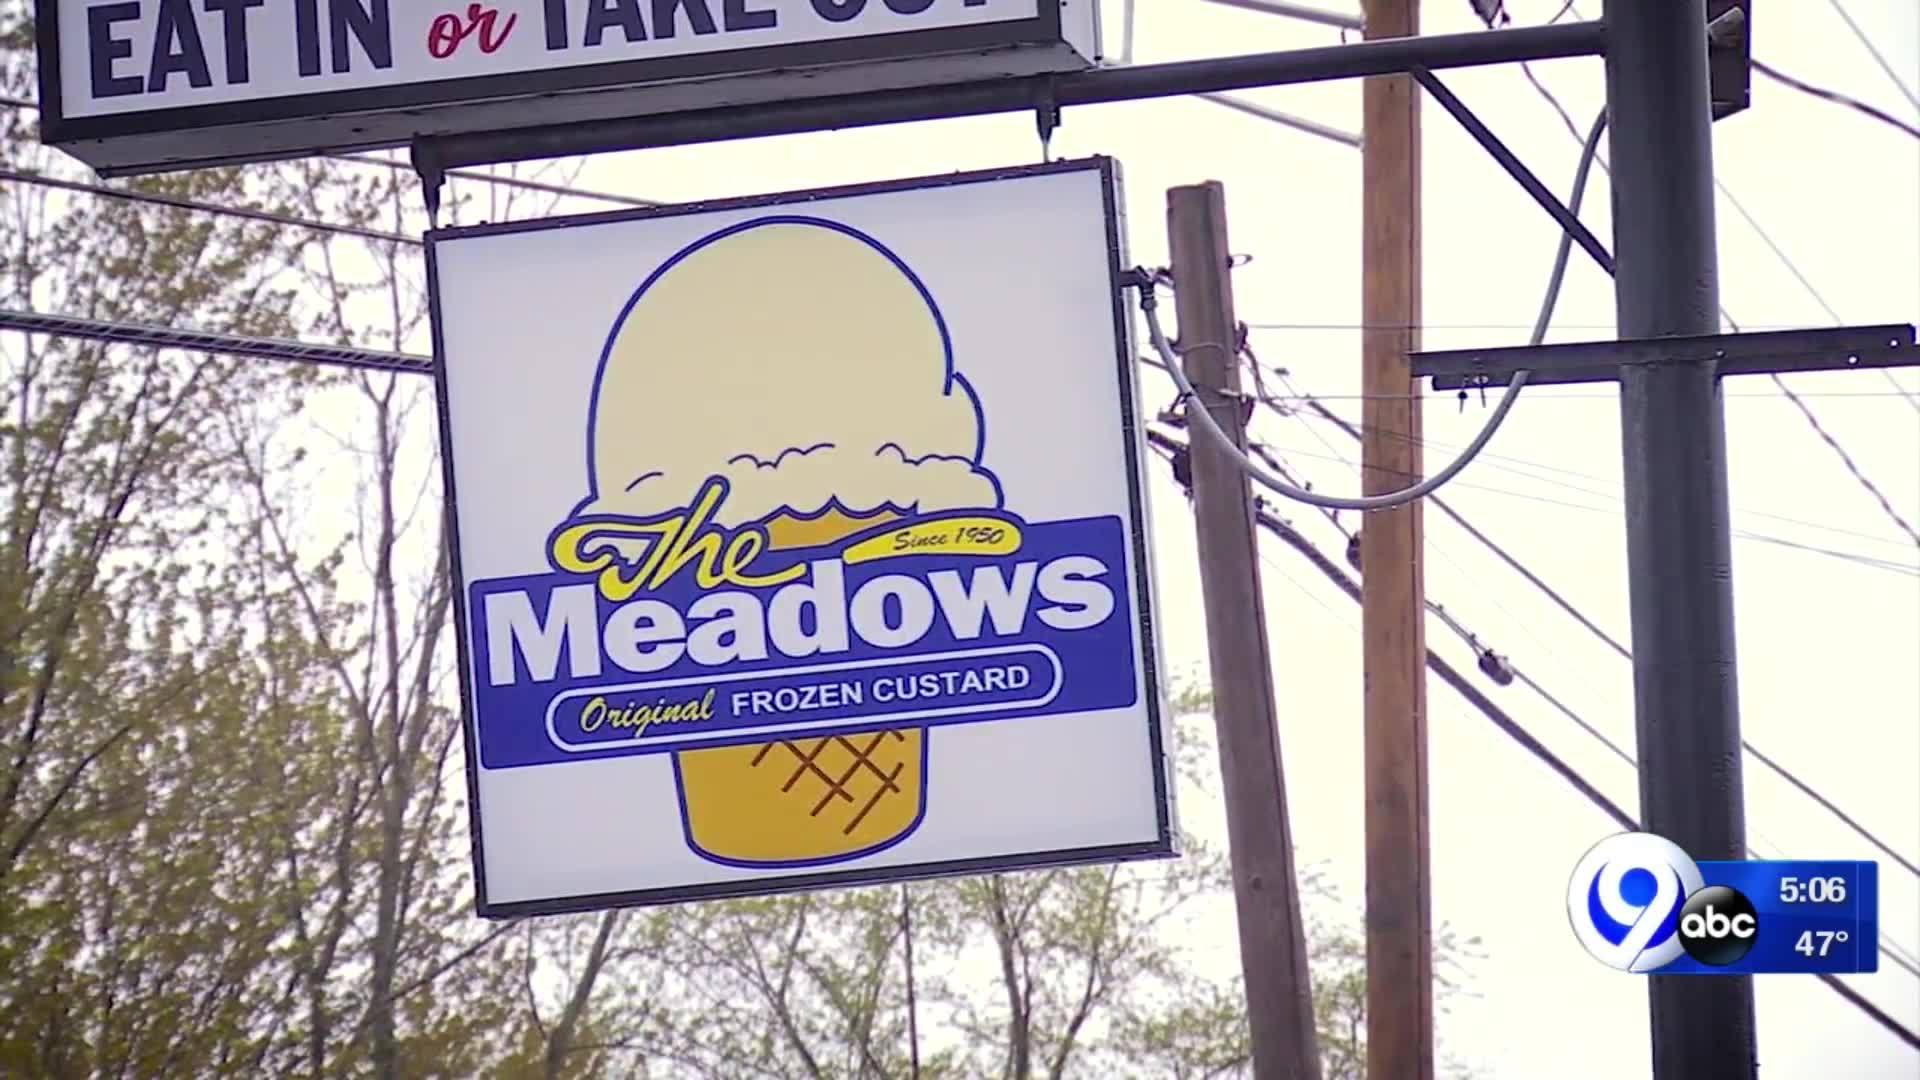 Meadows_of_Cicero_open_at_Bridgeport_Din_6_20190514211108